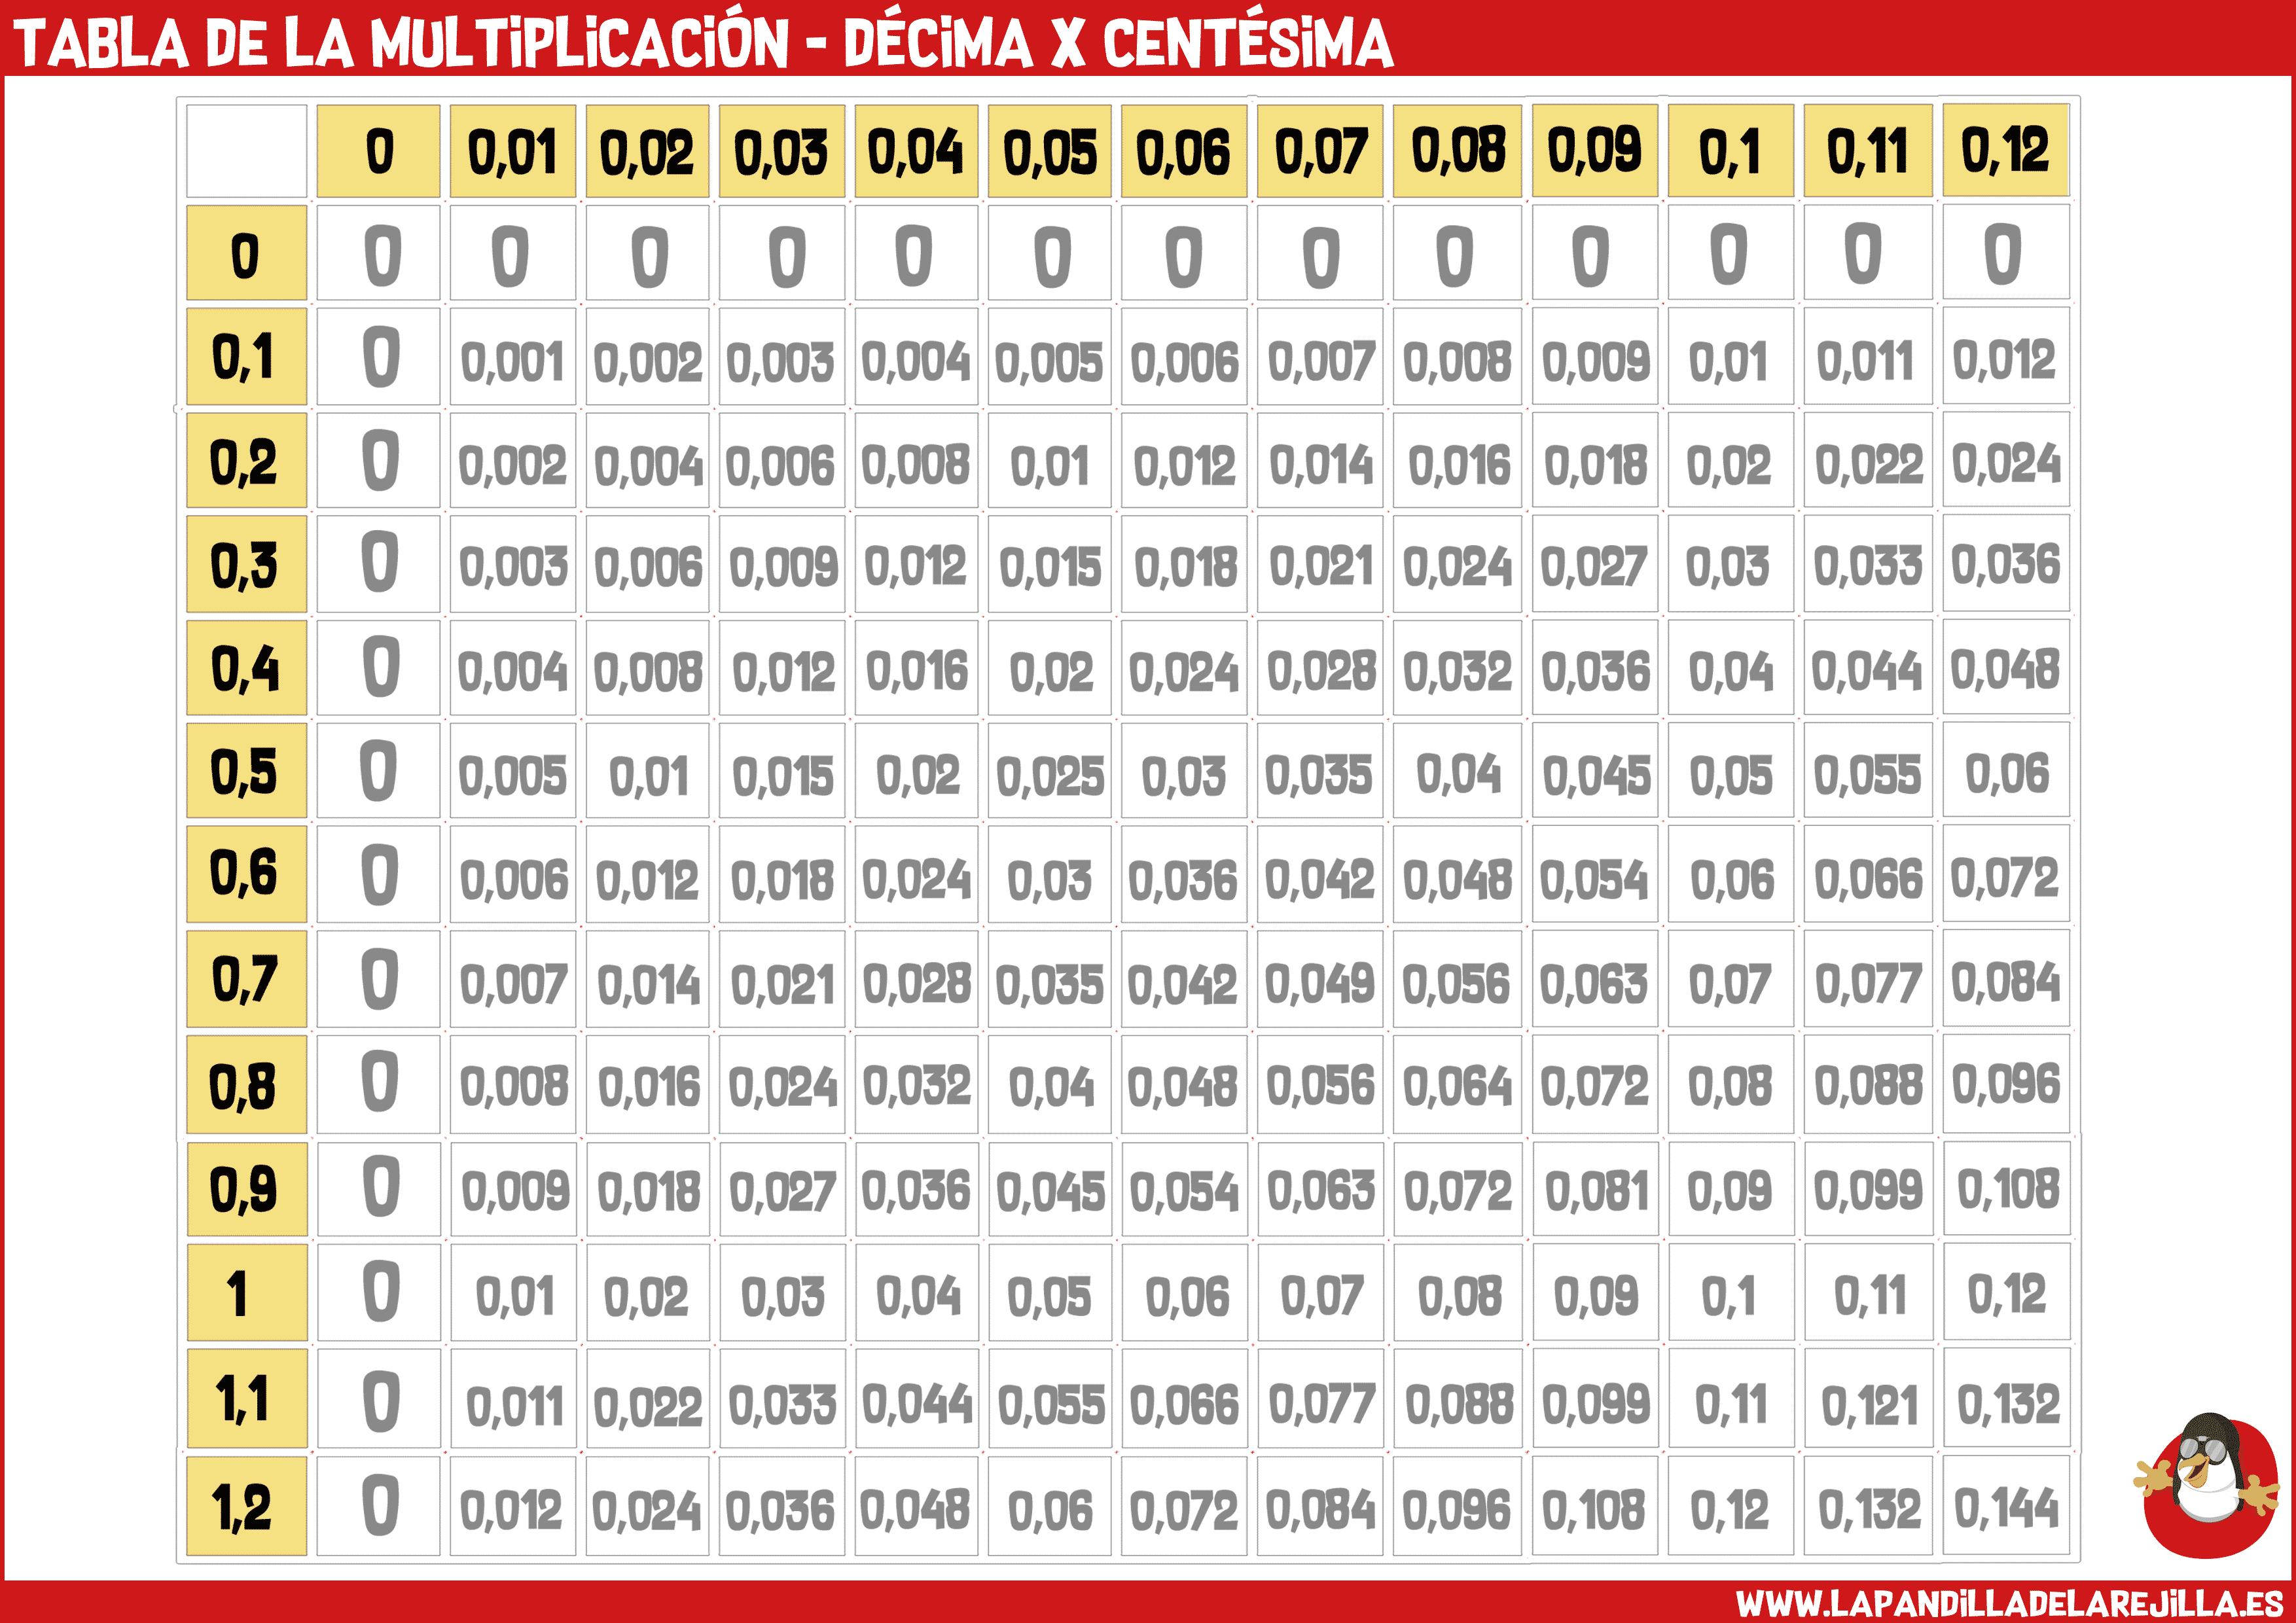 Tabla de la Multiplicacion - Decima x Centesima